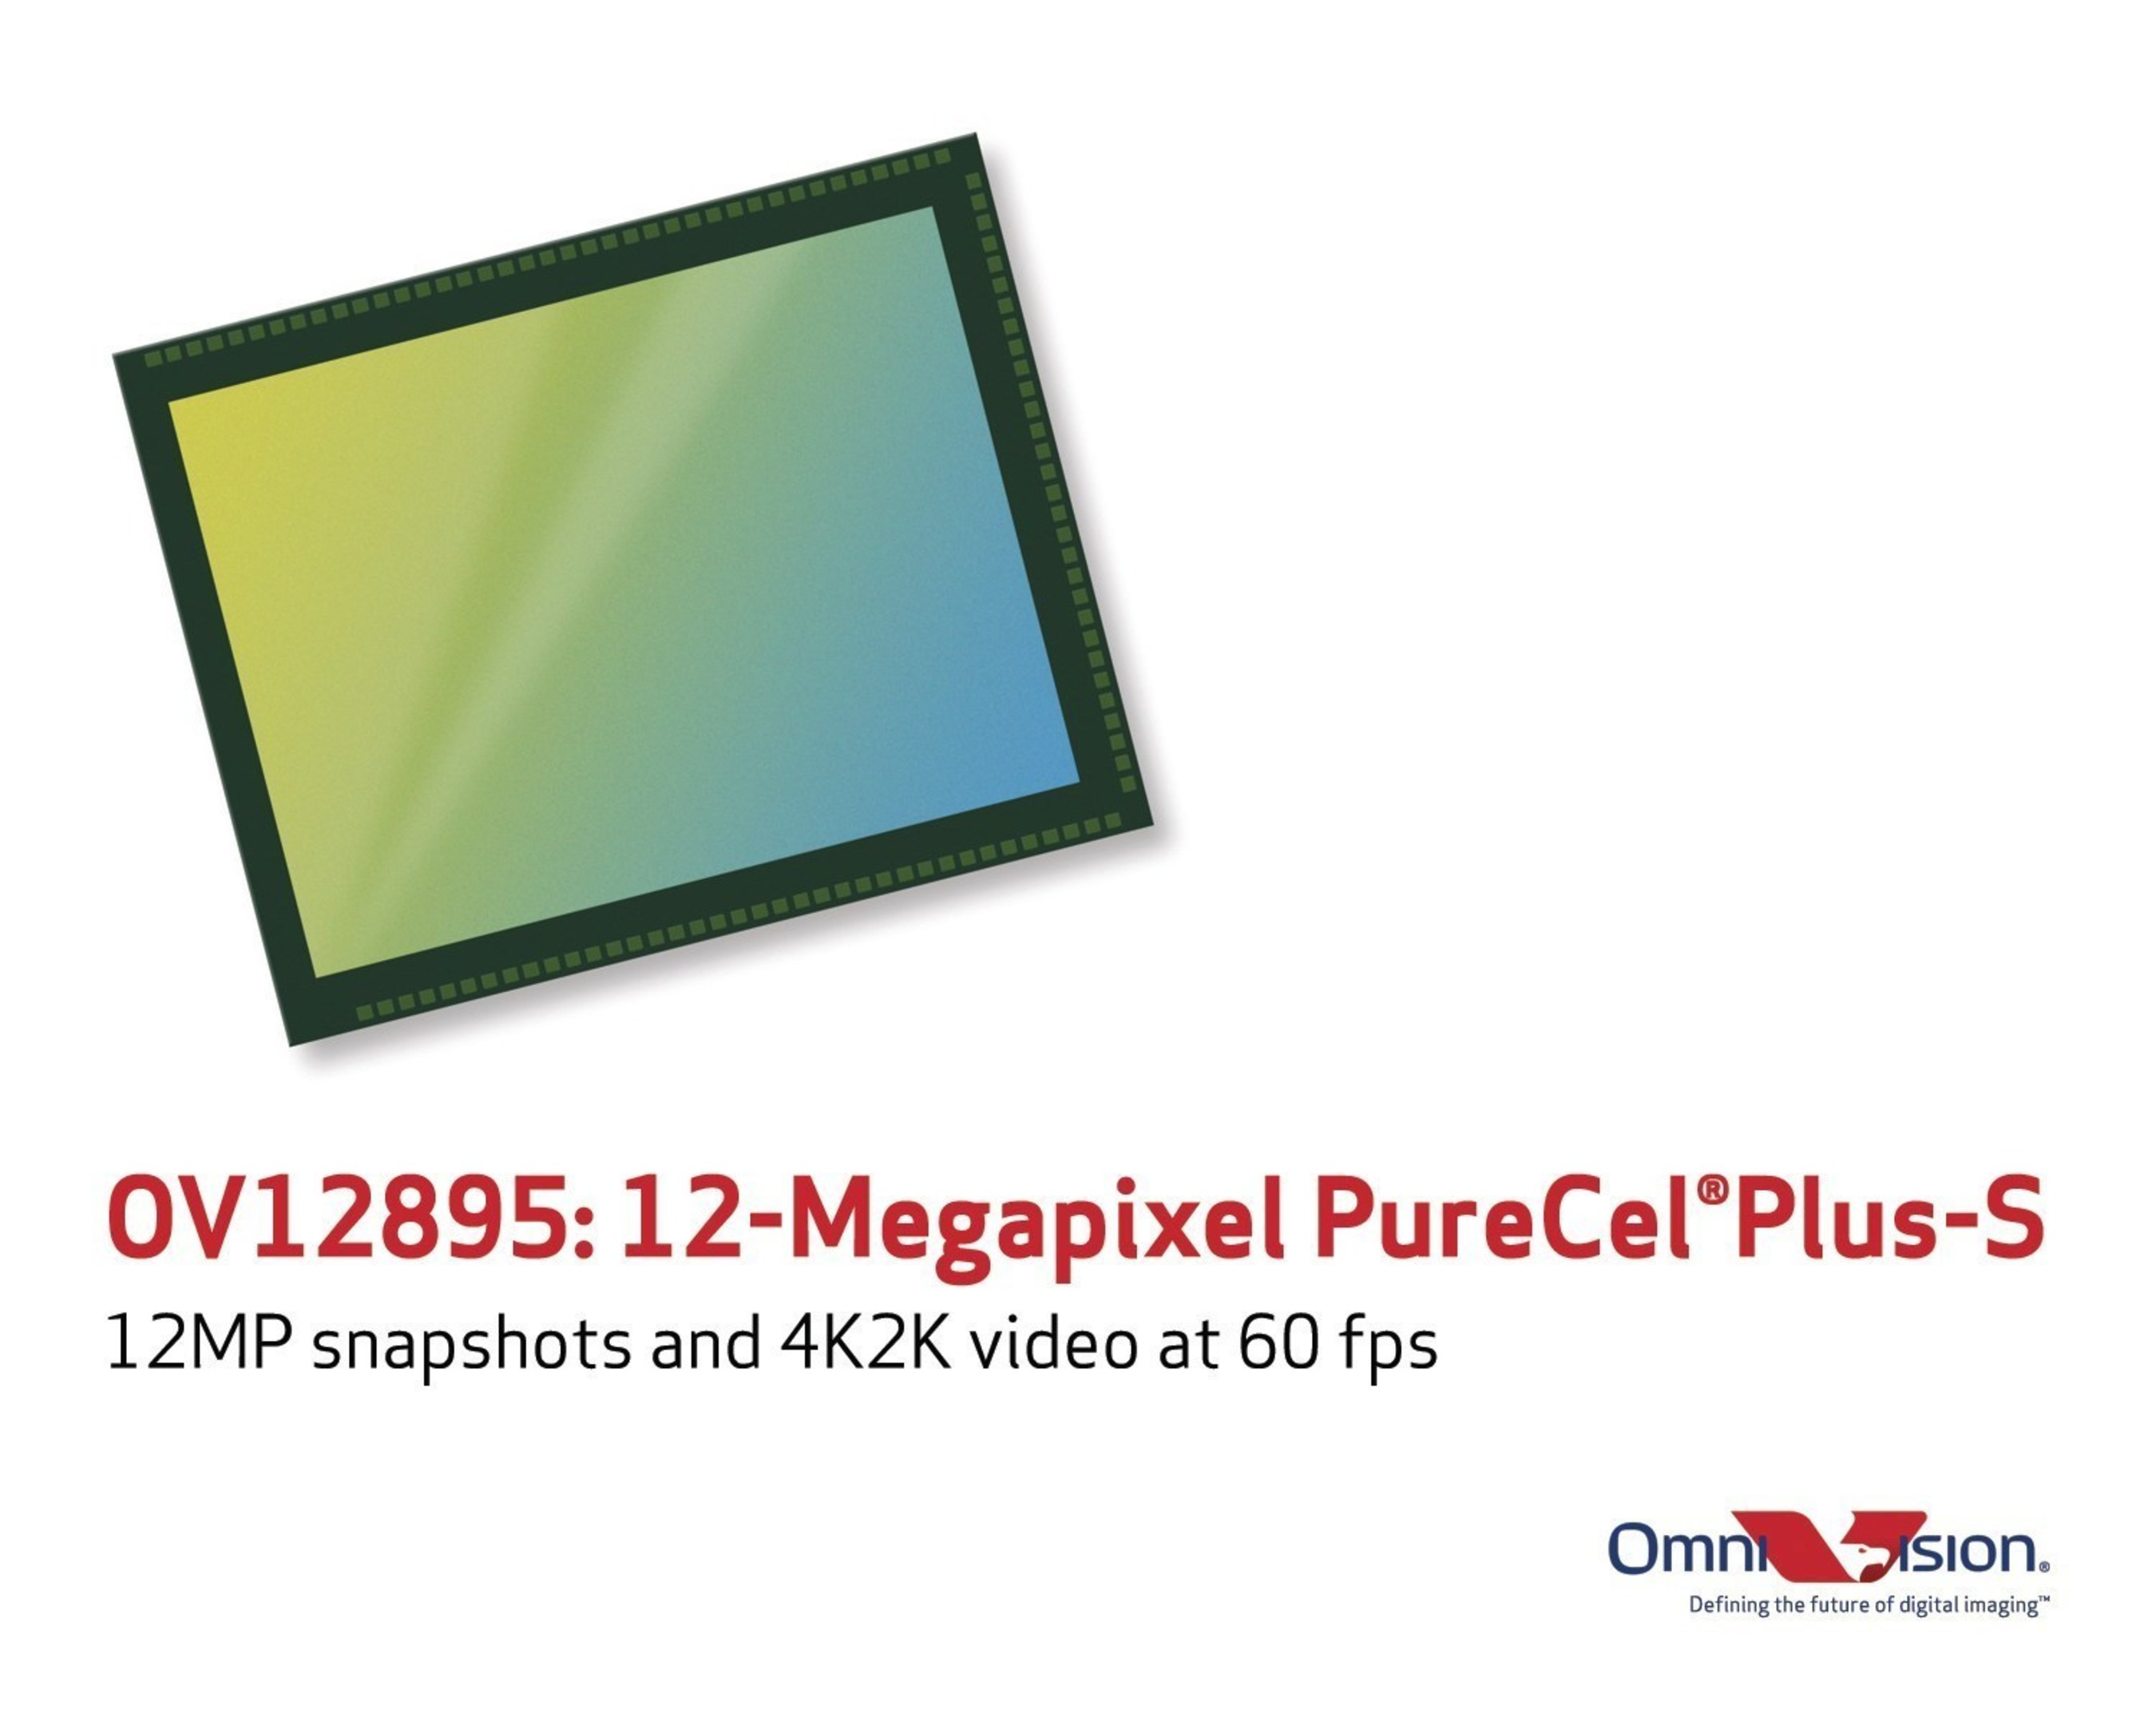 OmniVision Launches 12-Megapixel PureCel®Plus-S Sensor for High-End ...